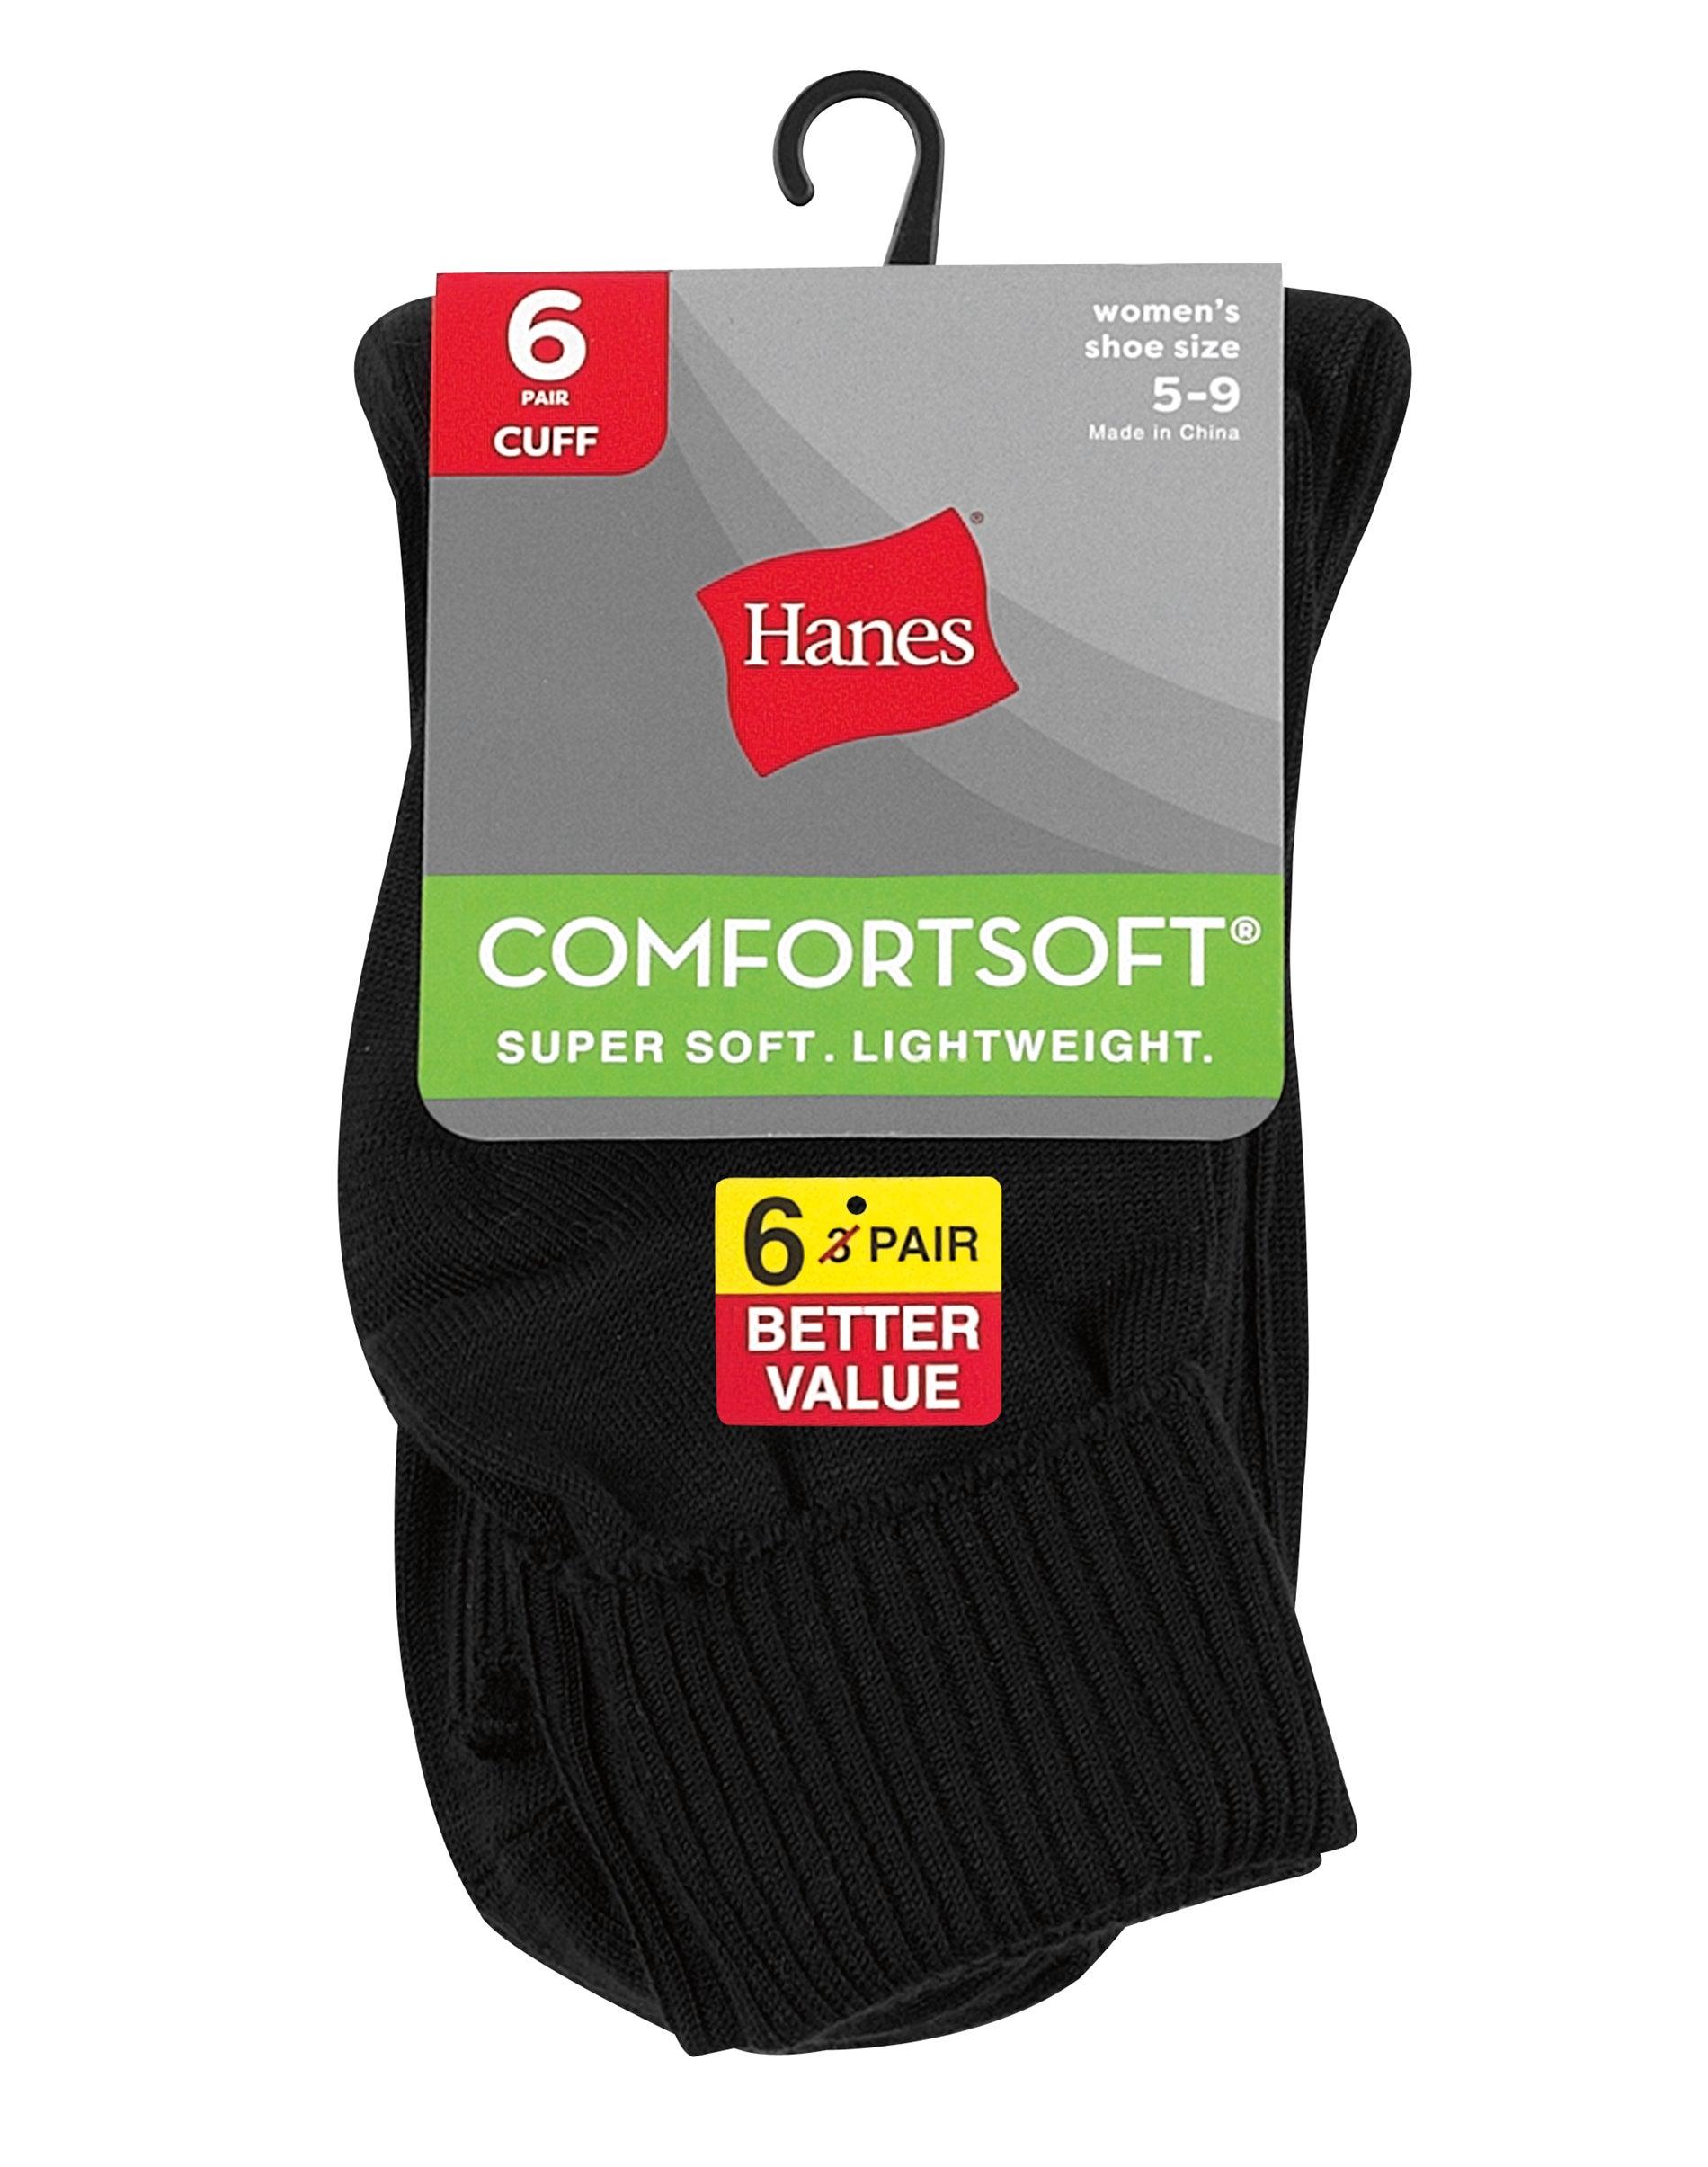 Low Cut Socks 3-Pack Hanes ComfortSoft Women/'s Lightweight shoe sizes 8-12 /& 5-9